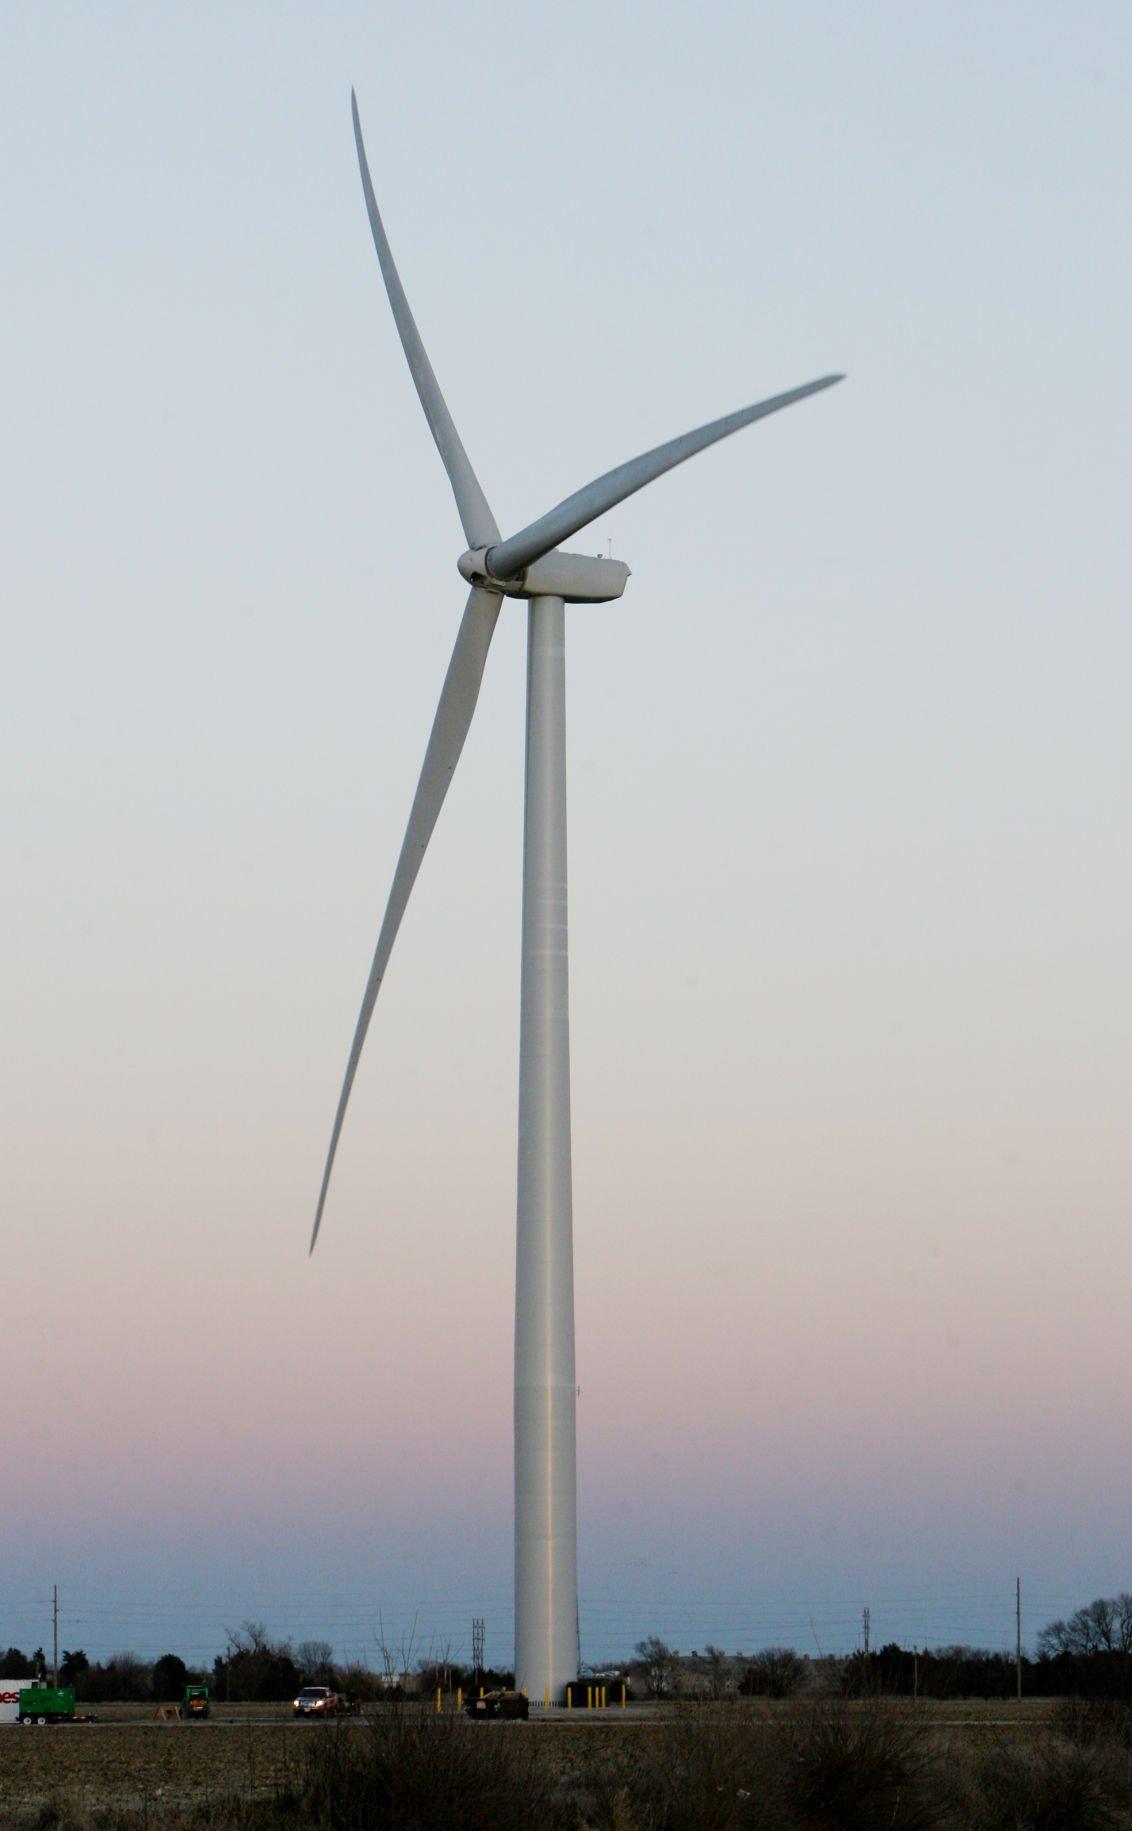 Ccc Wind Turbine Source Of Energy Education News